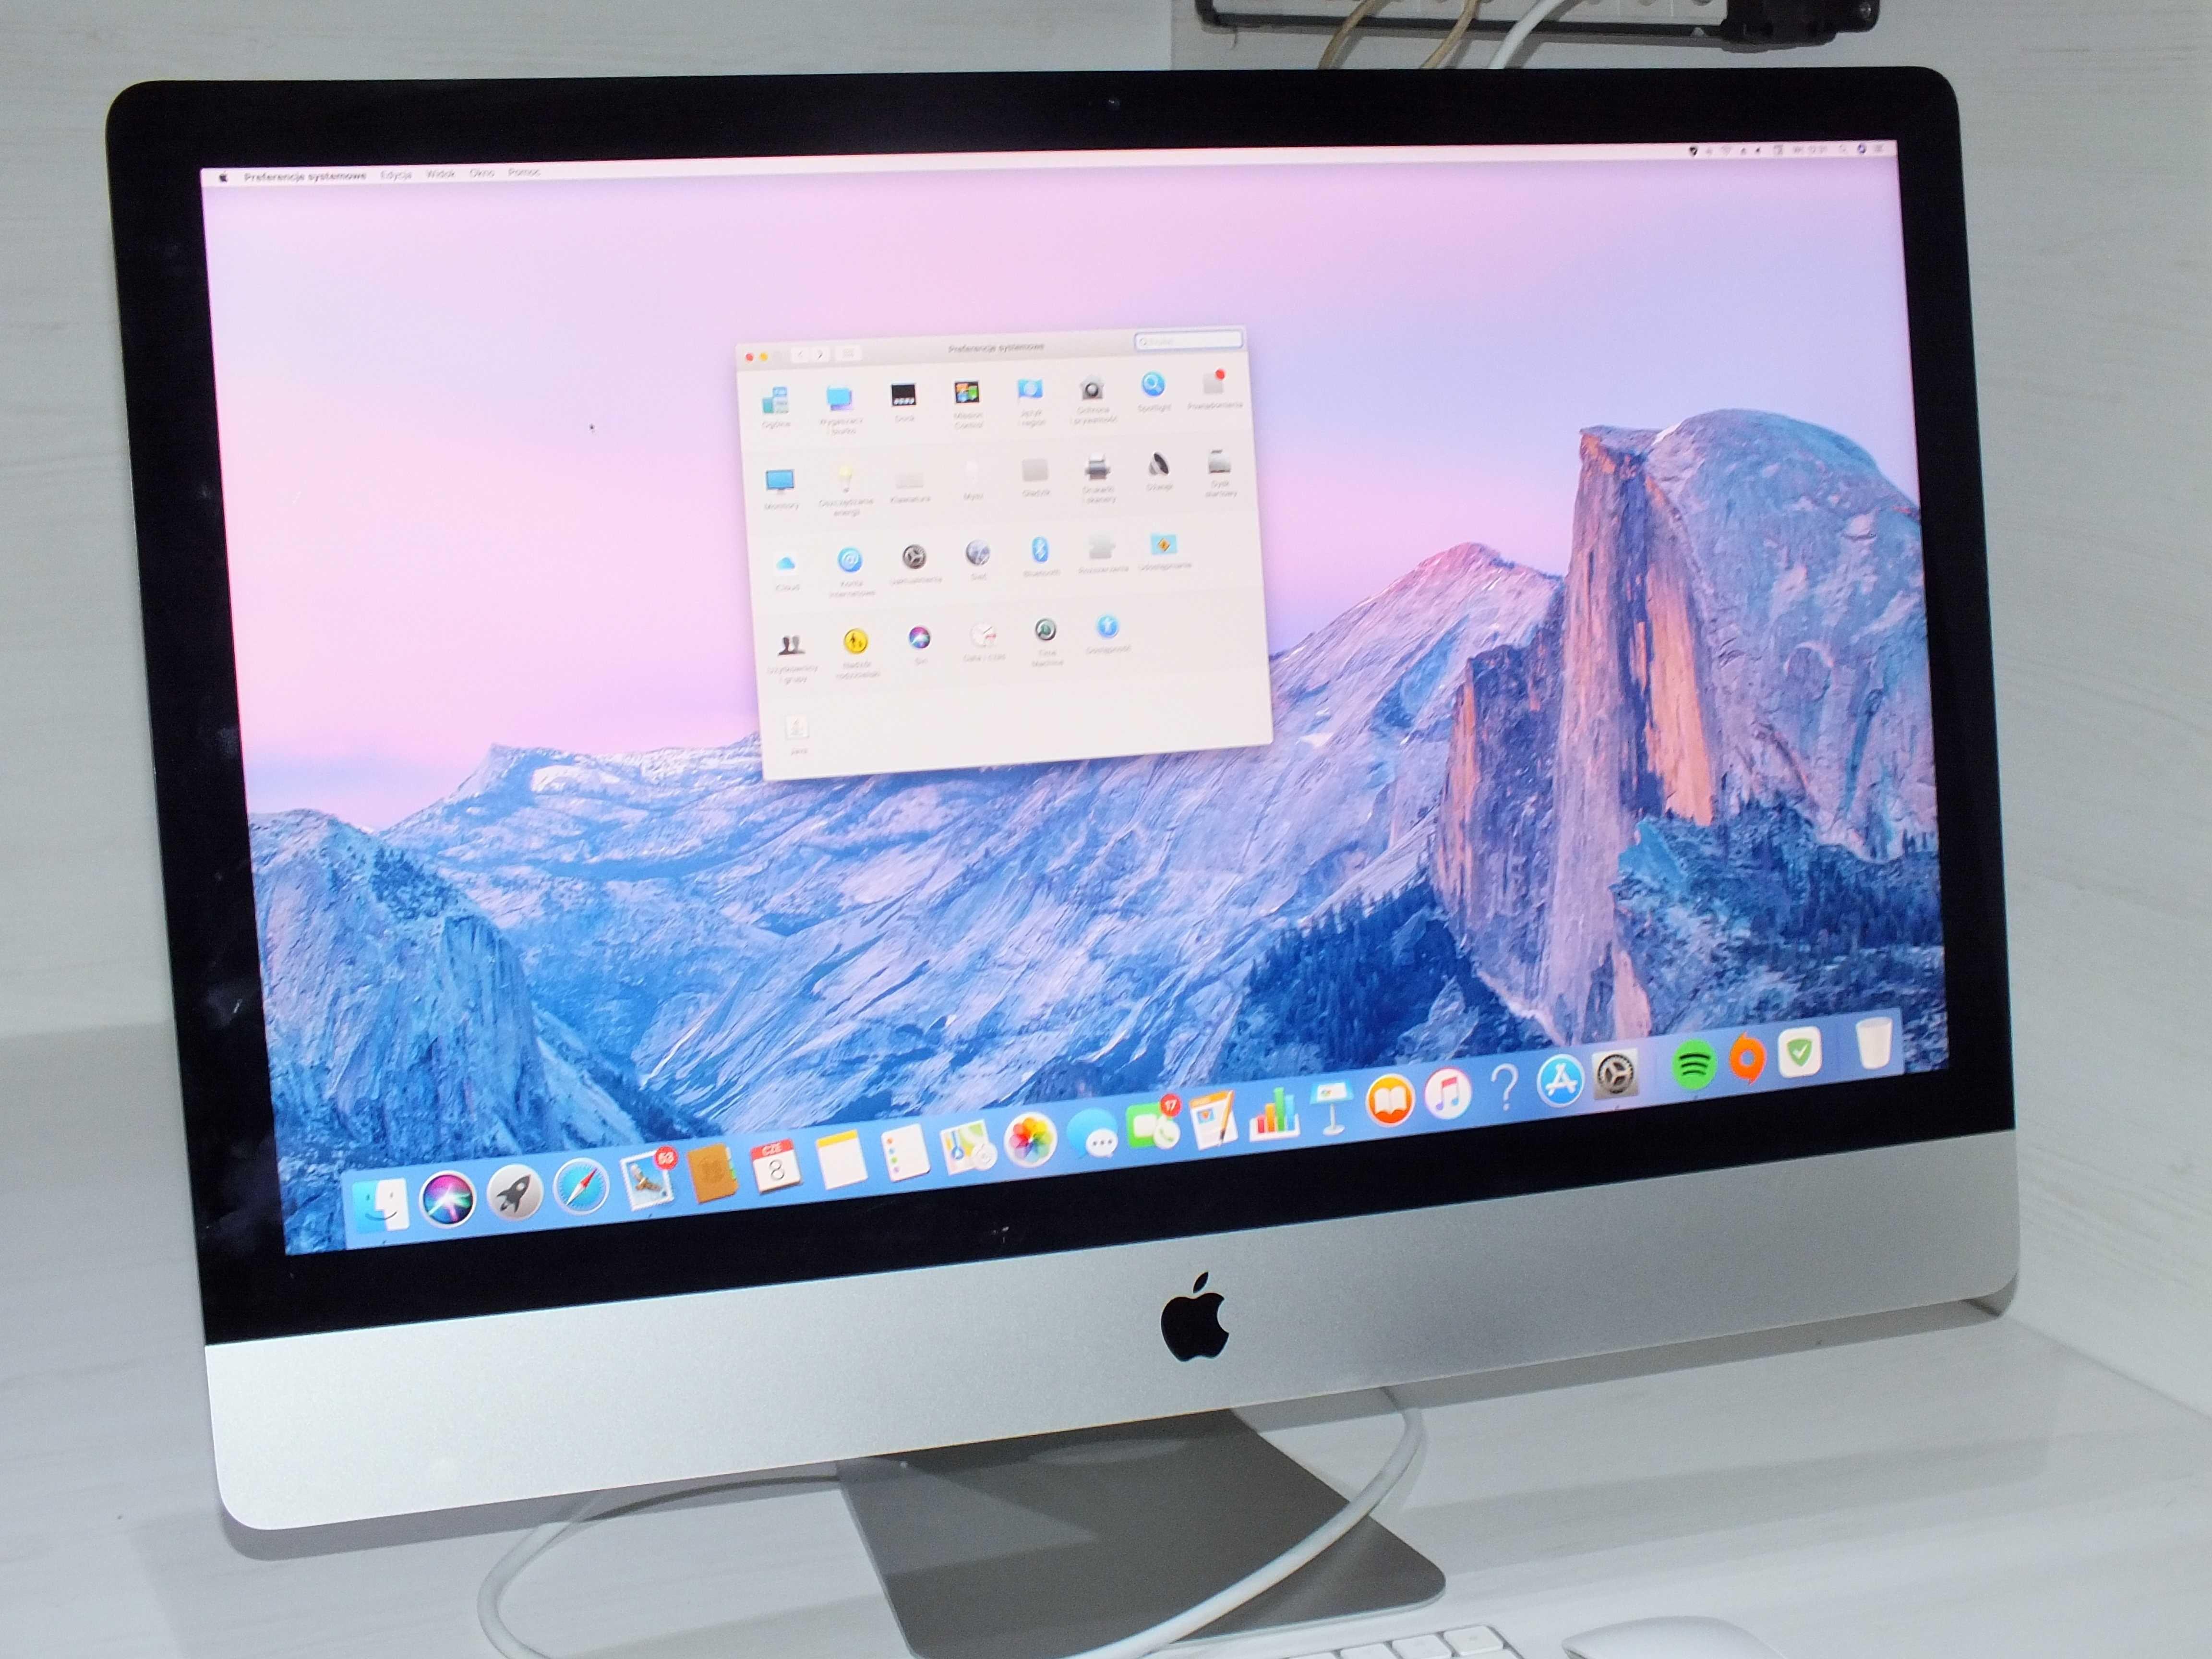 "**Komputer iMac 27"" Retina 5K 2017-Lombard Stówka**"